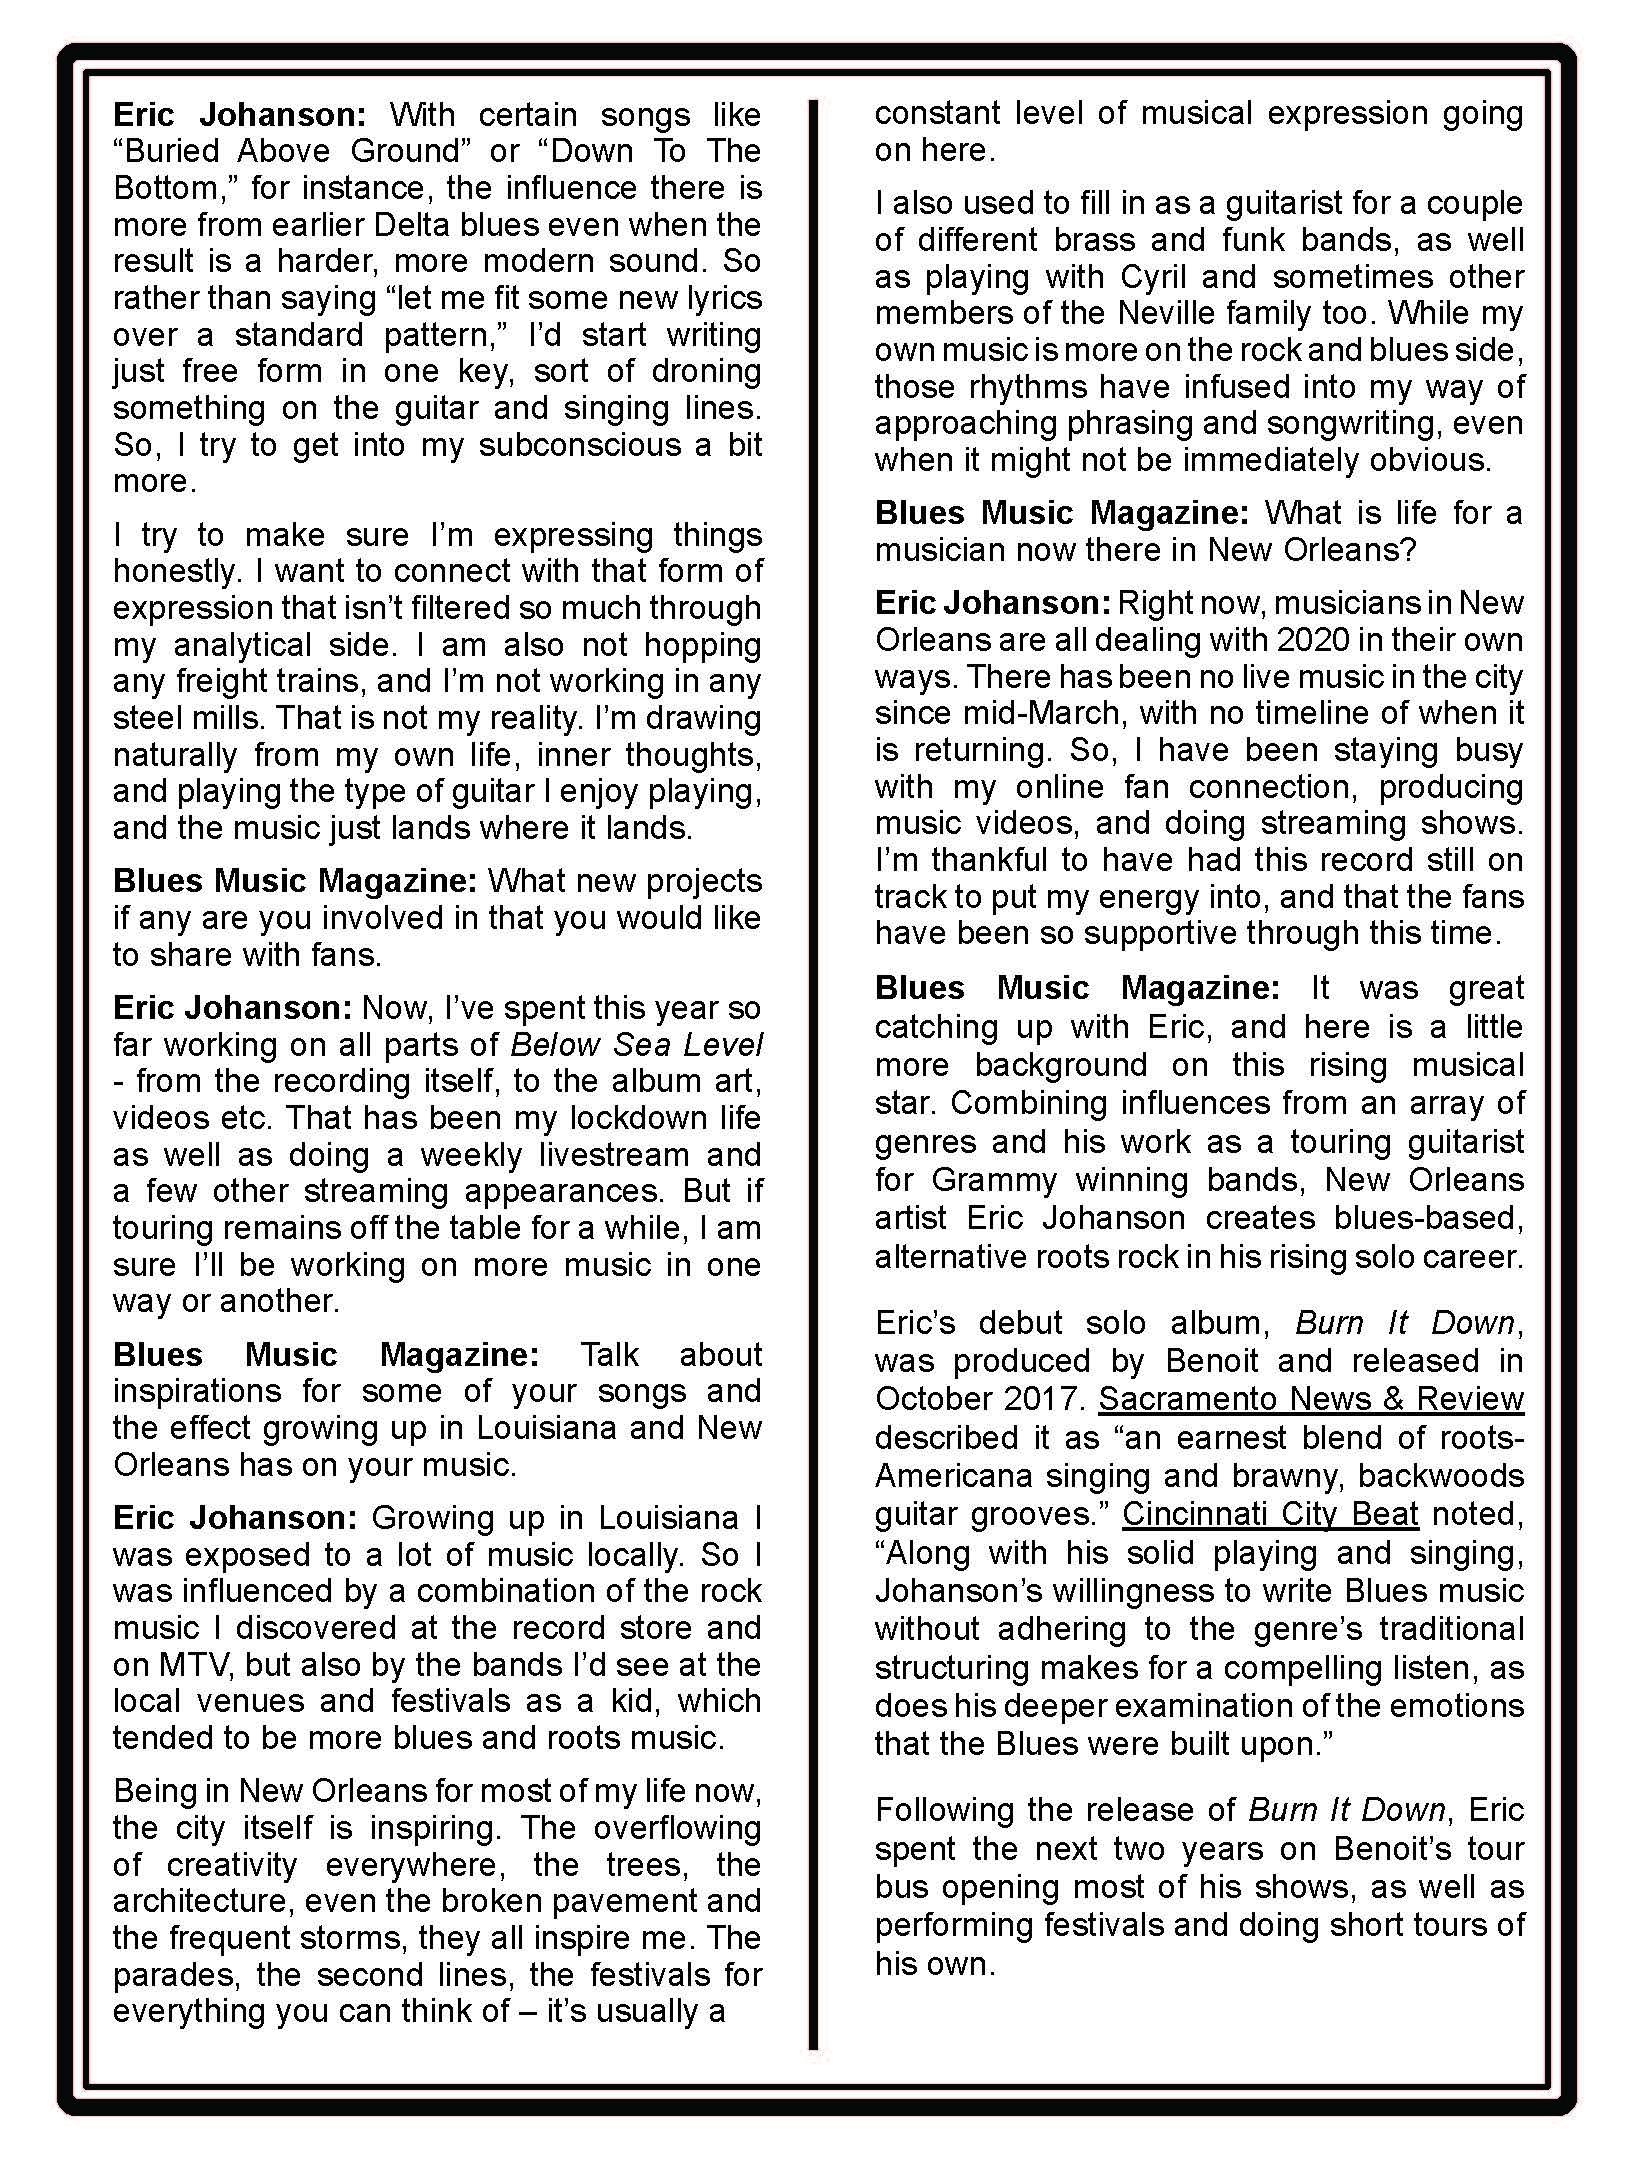 bmo-oct-4-2020-eric-johanson-page-12.jpg